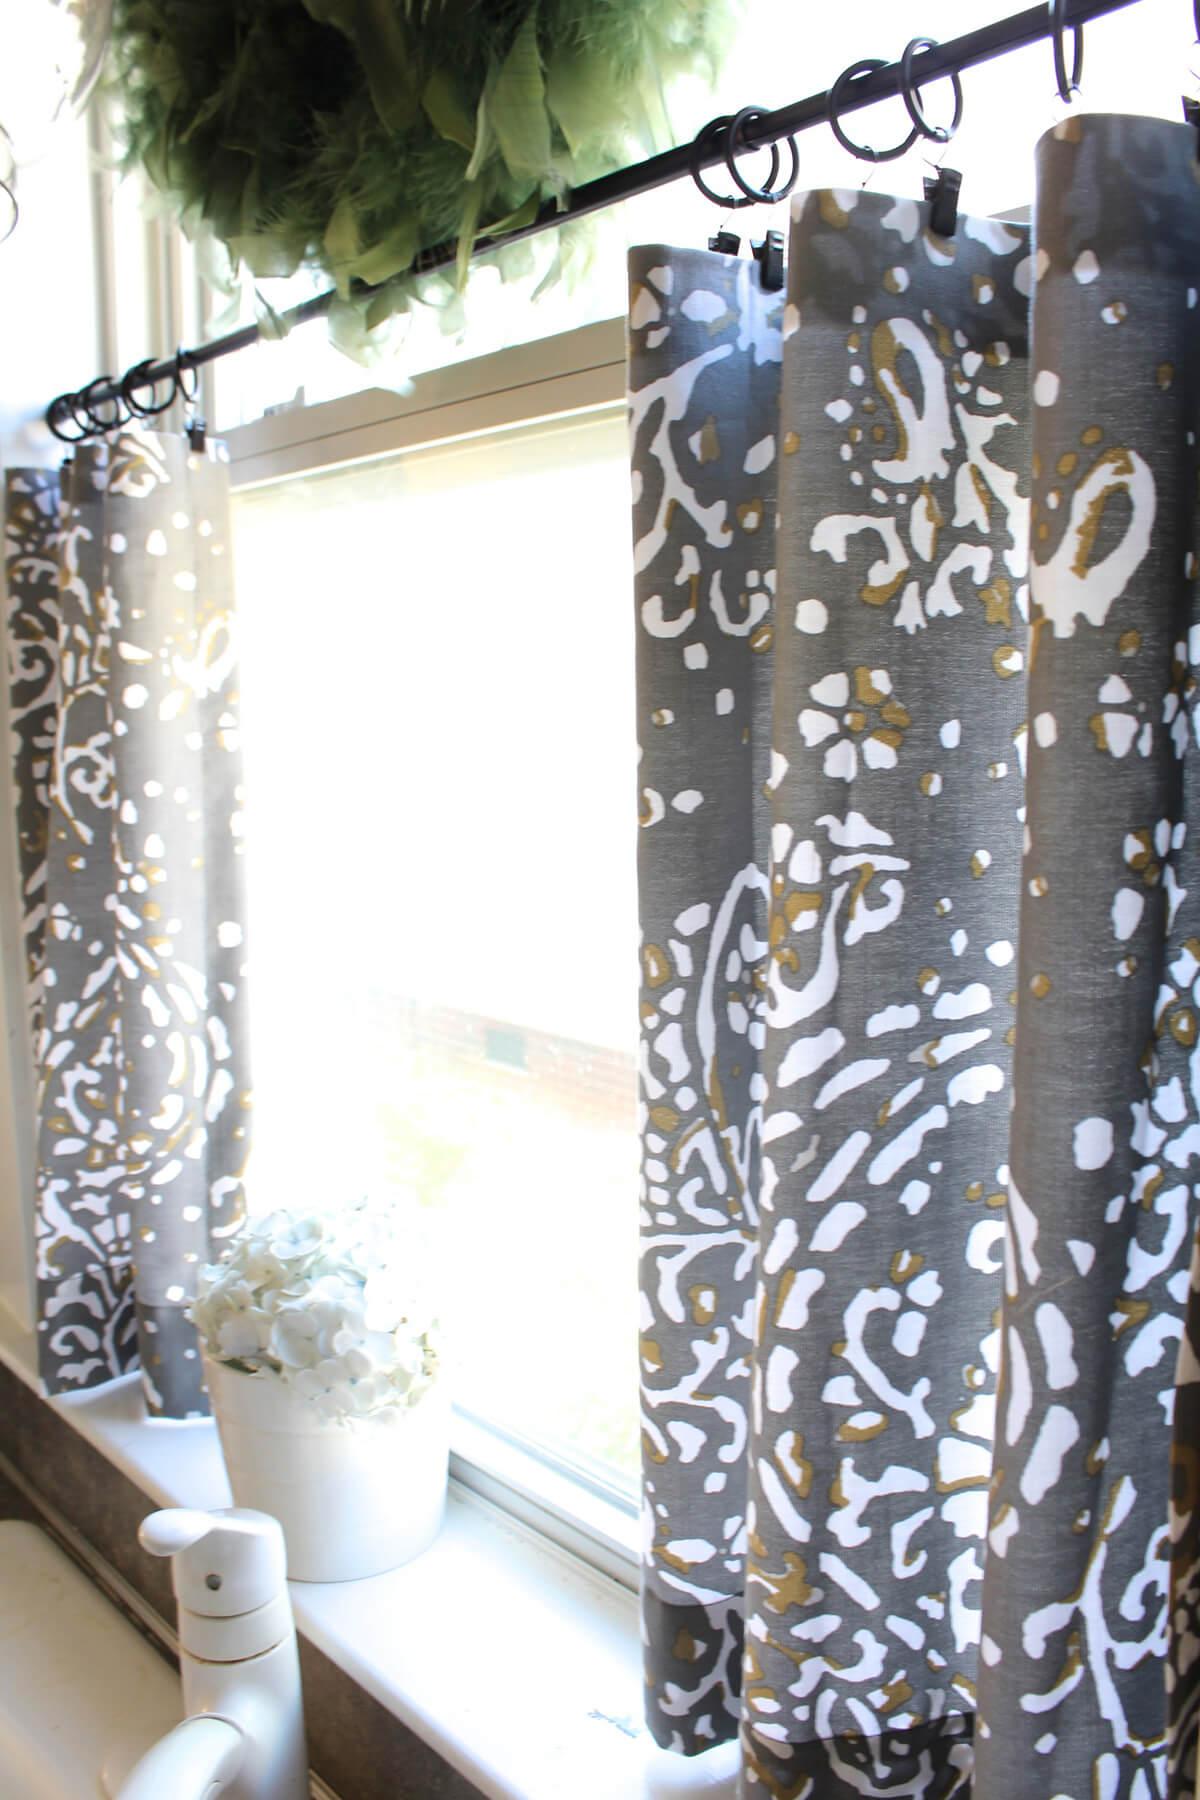 Change Café Curtains for a Quick Update